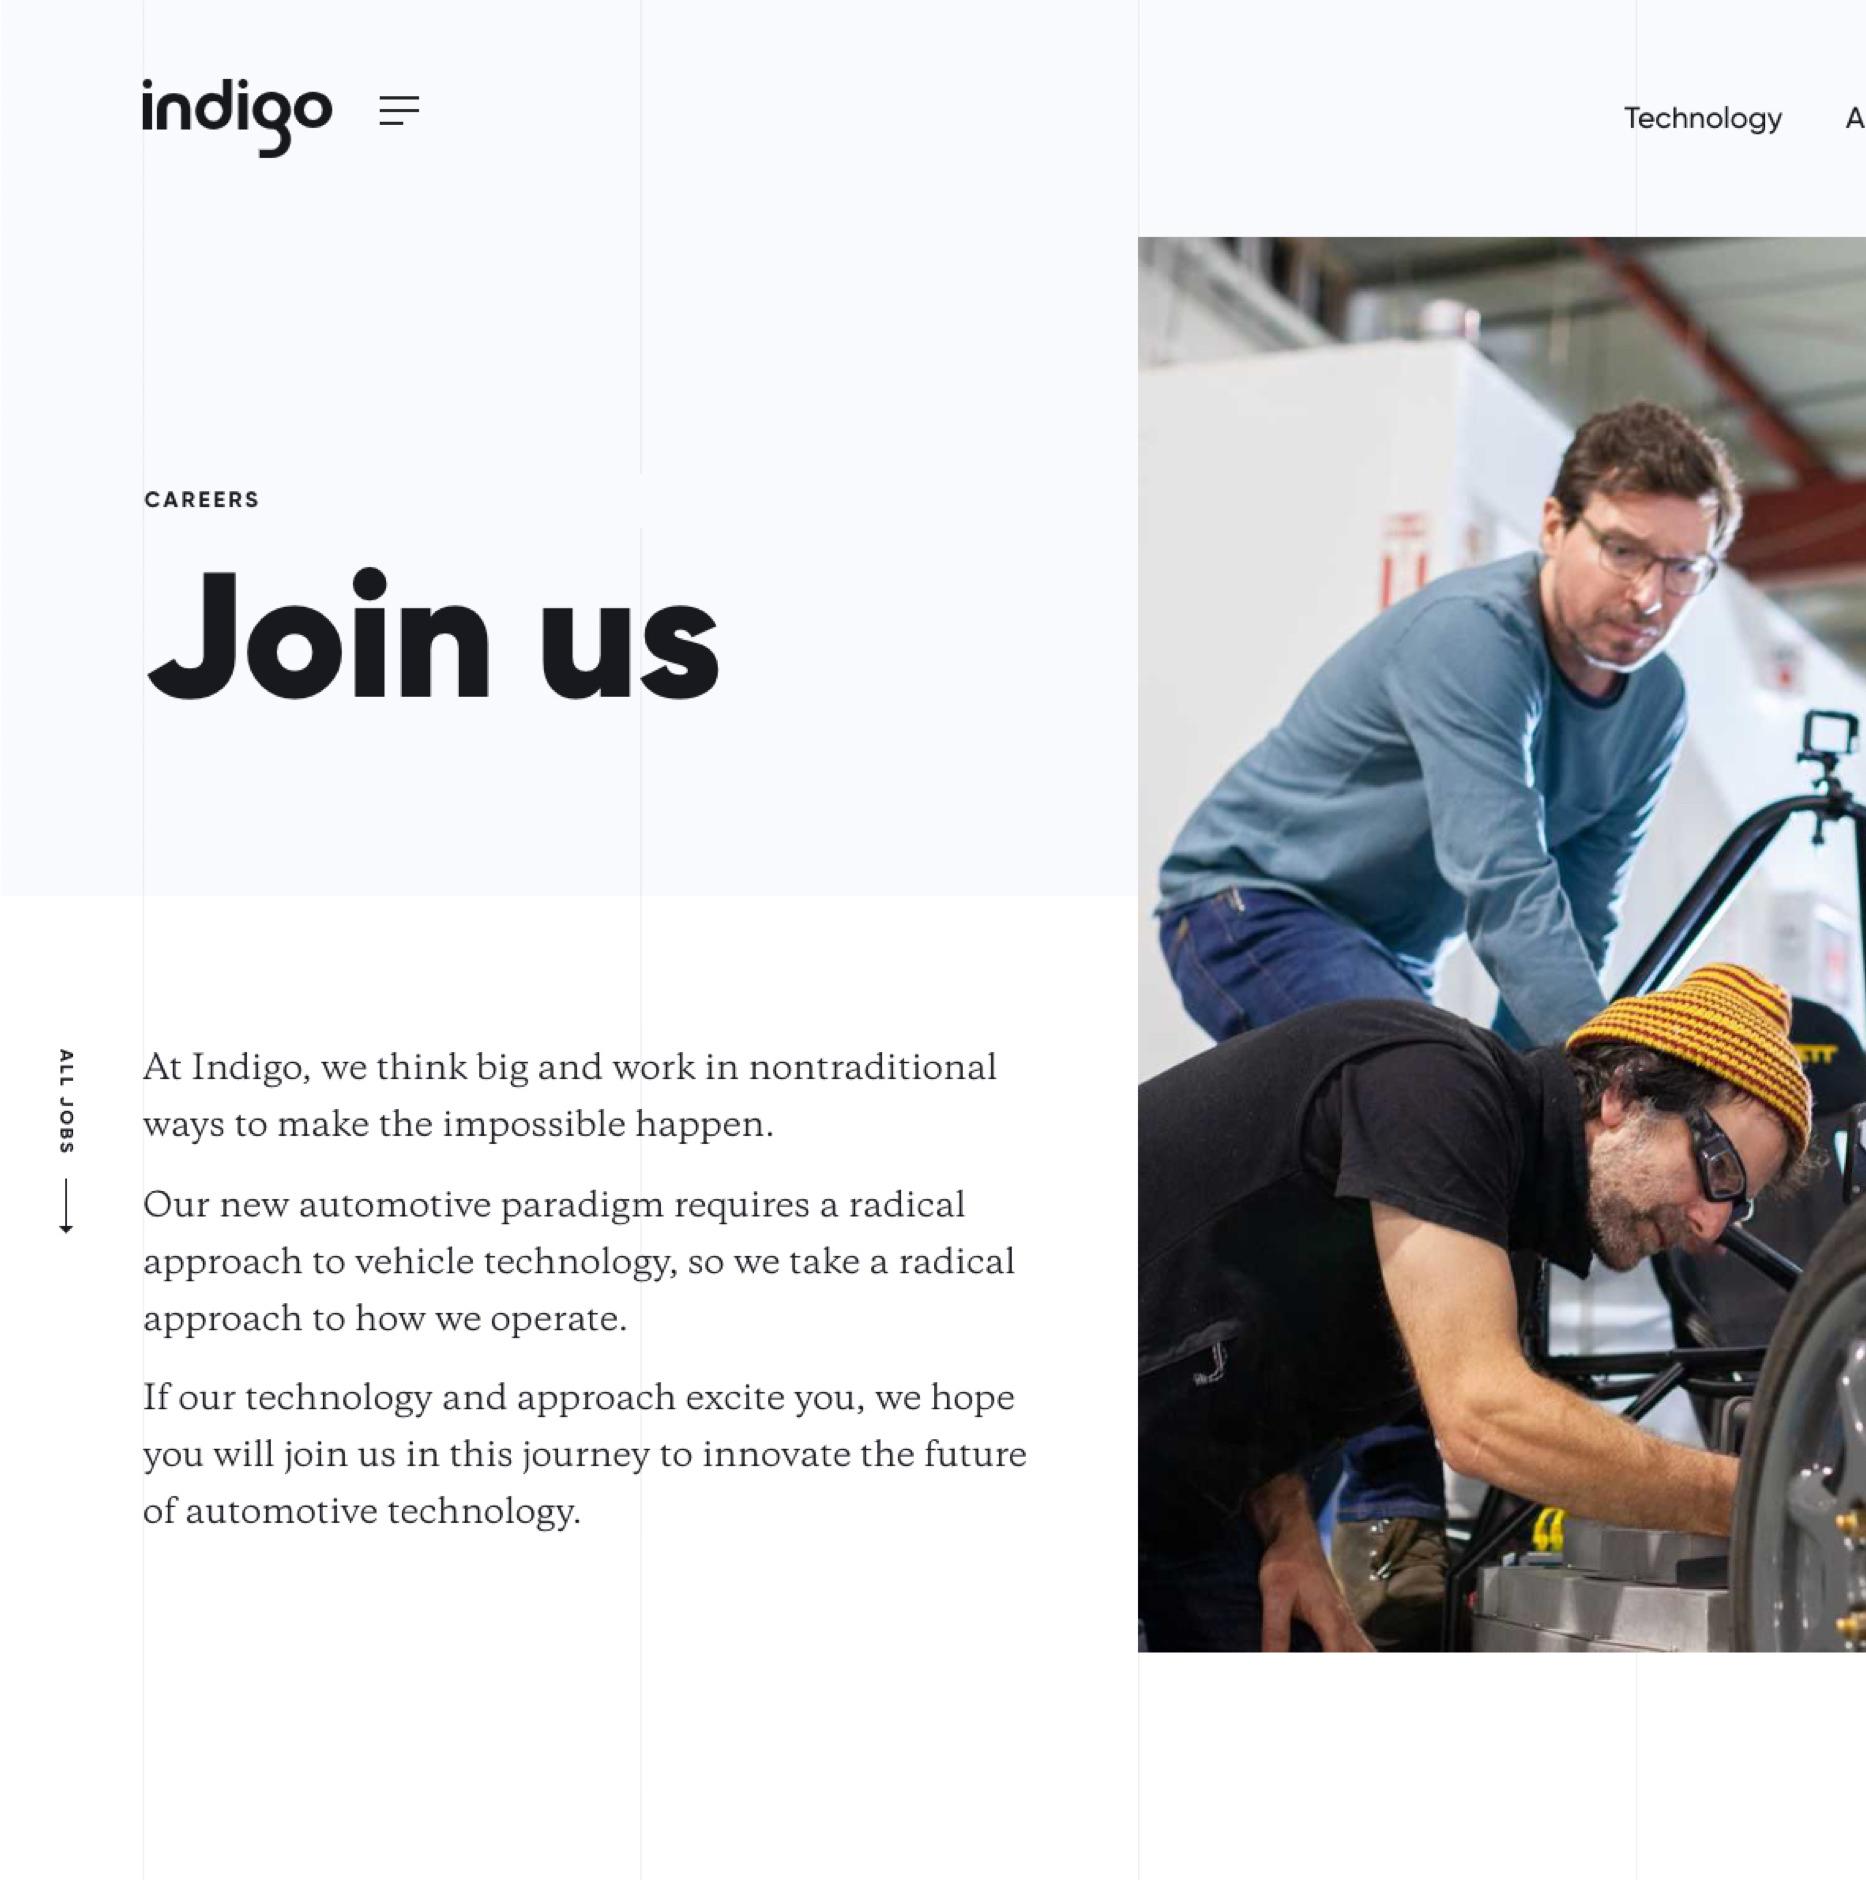 Indigo Careers Page